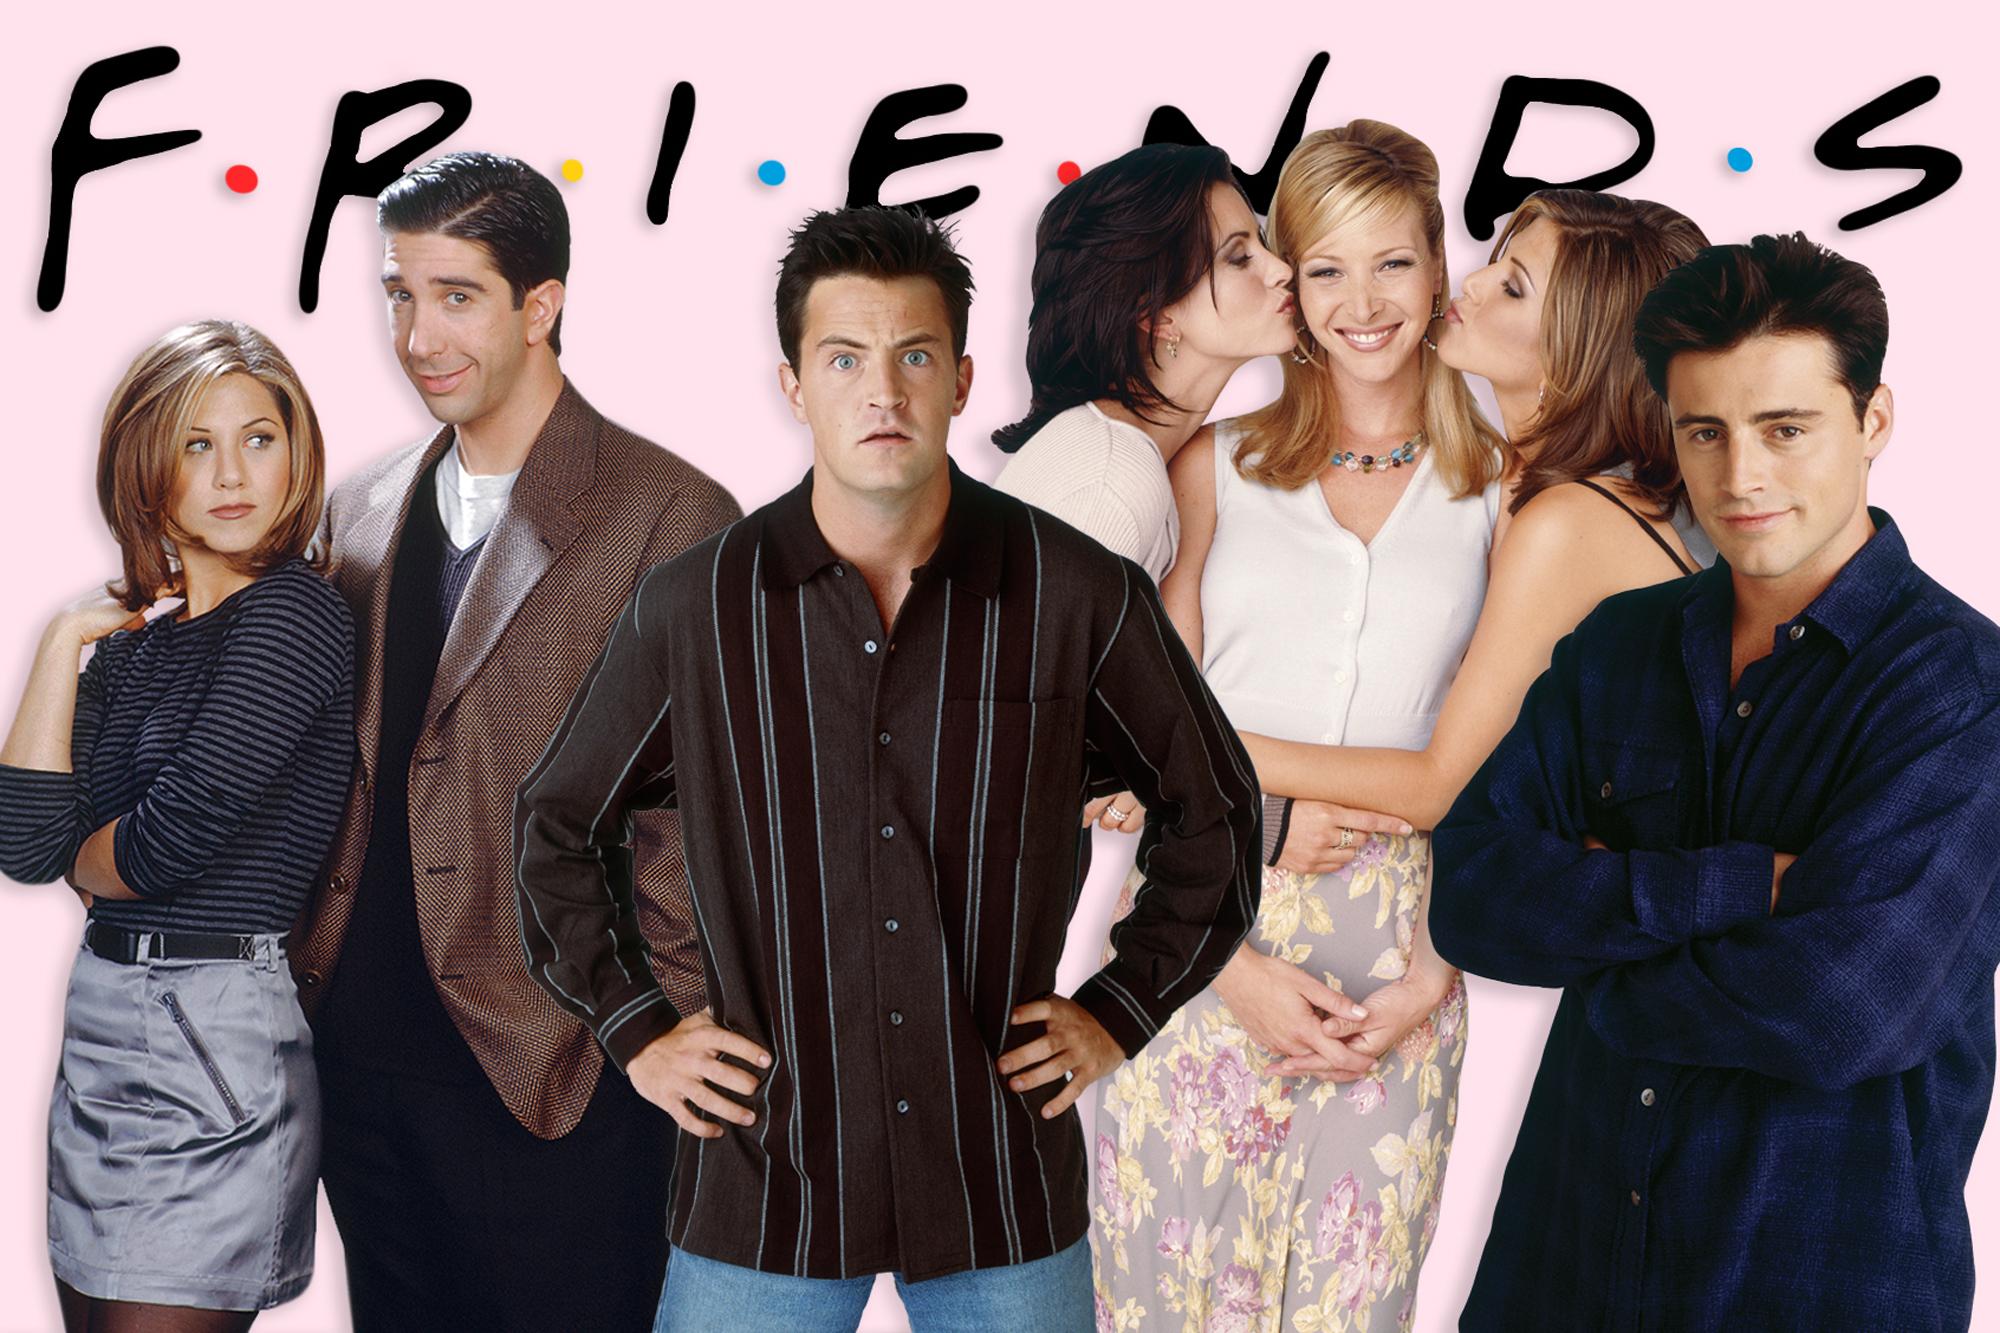 lorindale comedy friends